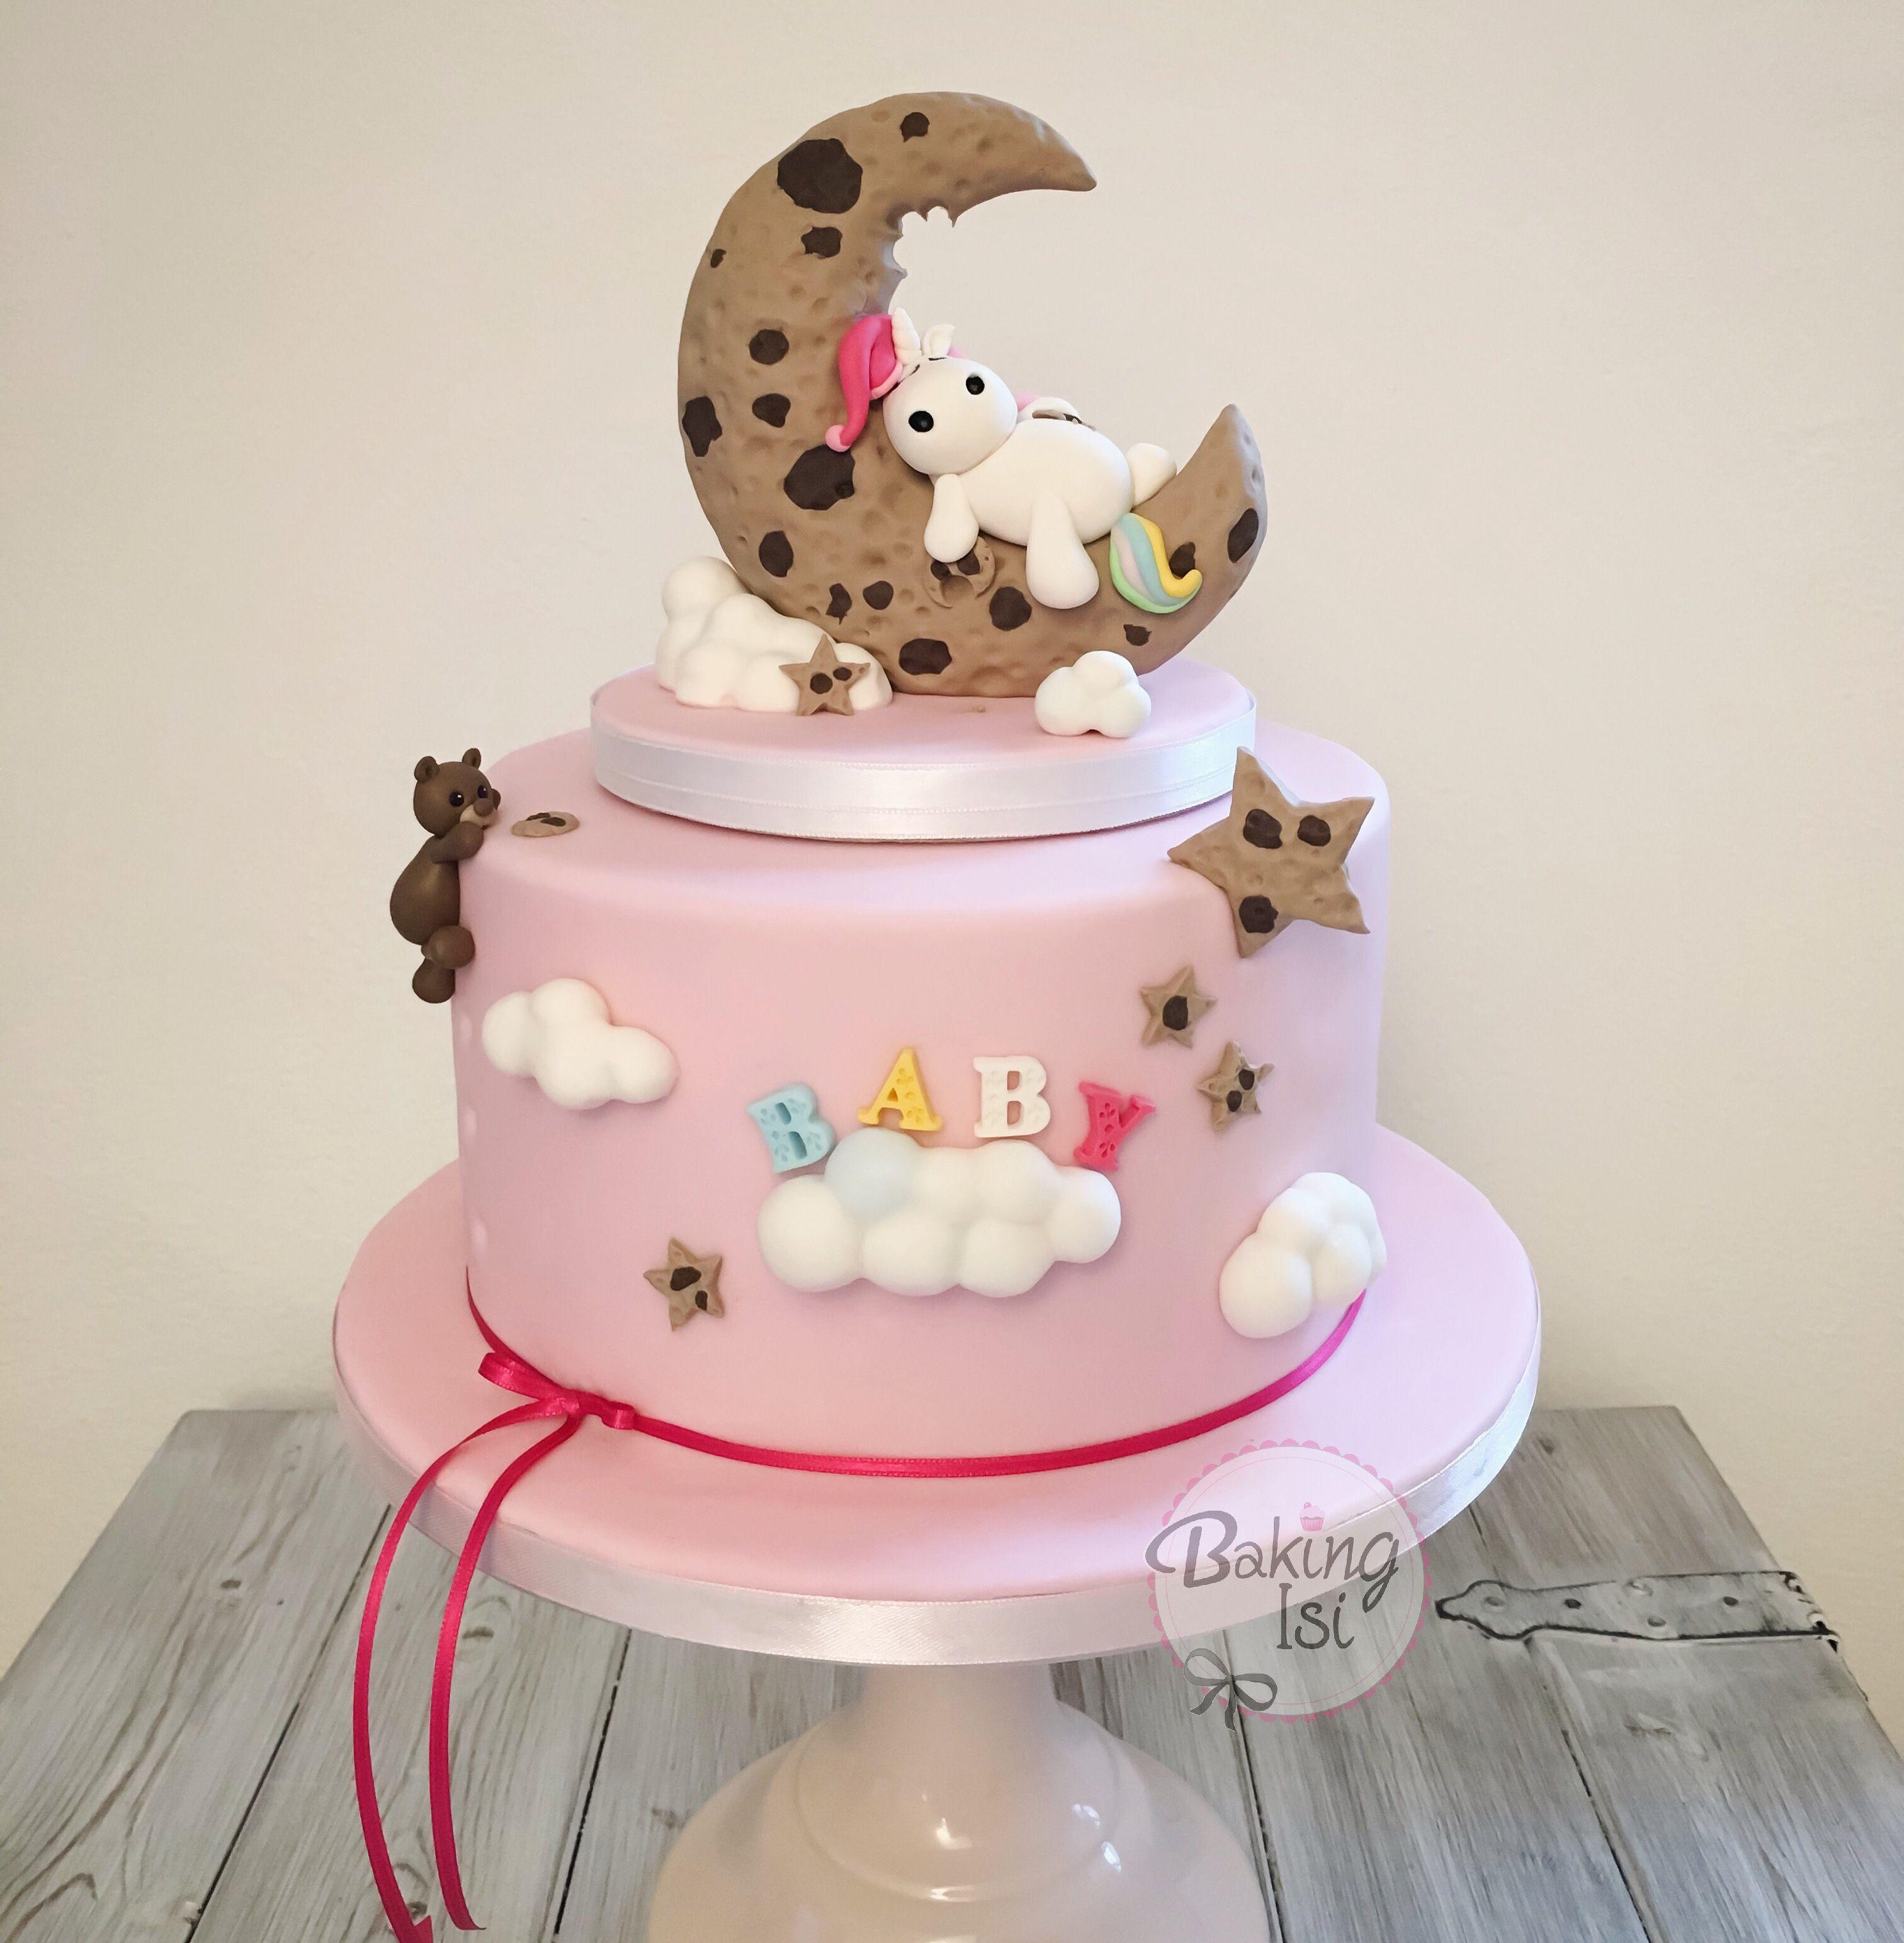 baby shower cake unicorn cookie moon keksmond einhorn pummeleinhorn torte cake fondant. Black Bedroom Furniture Sets. Home Design Ideas